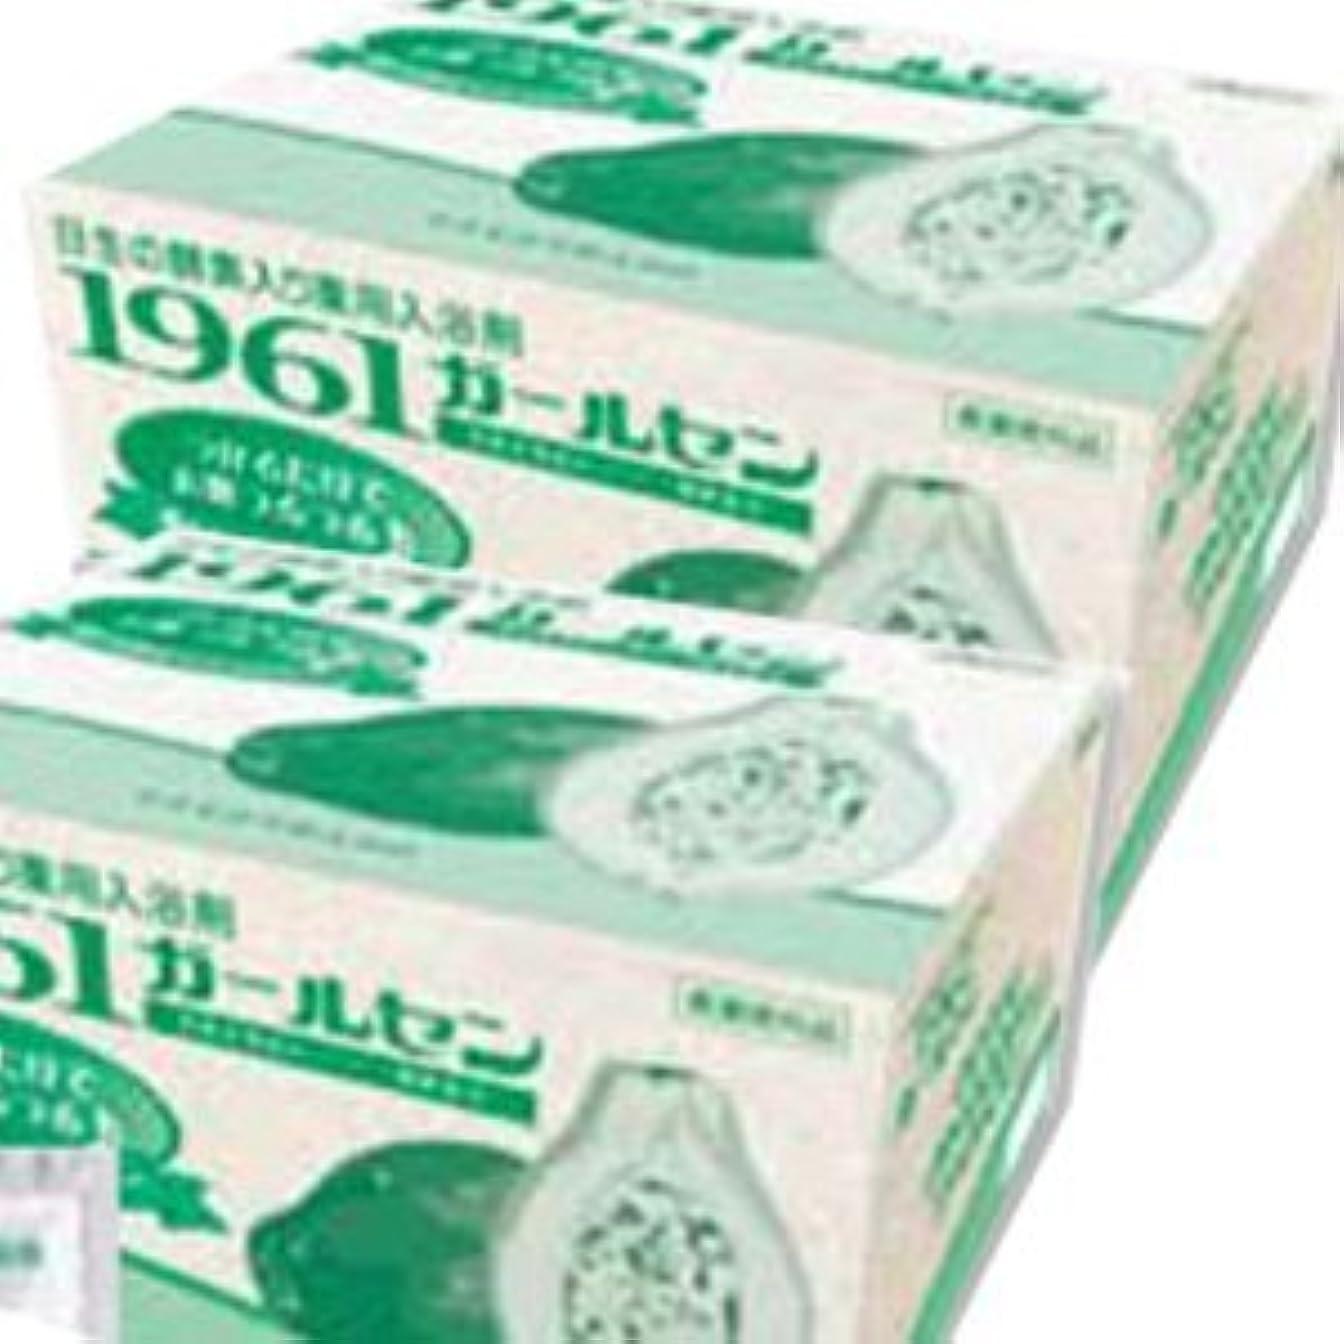 食用喉頭発言する日本生化学 薬用入浴剤 1961ガールセン (20g×60包)×2箱 (医薬部外品)